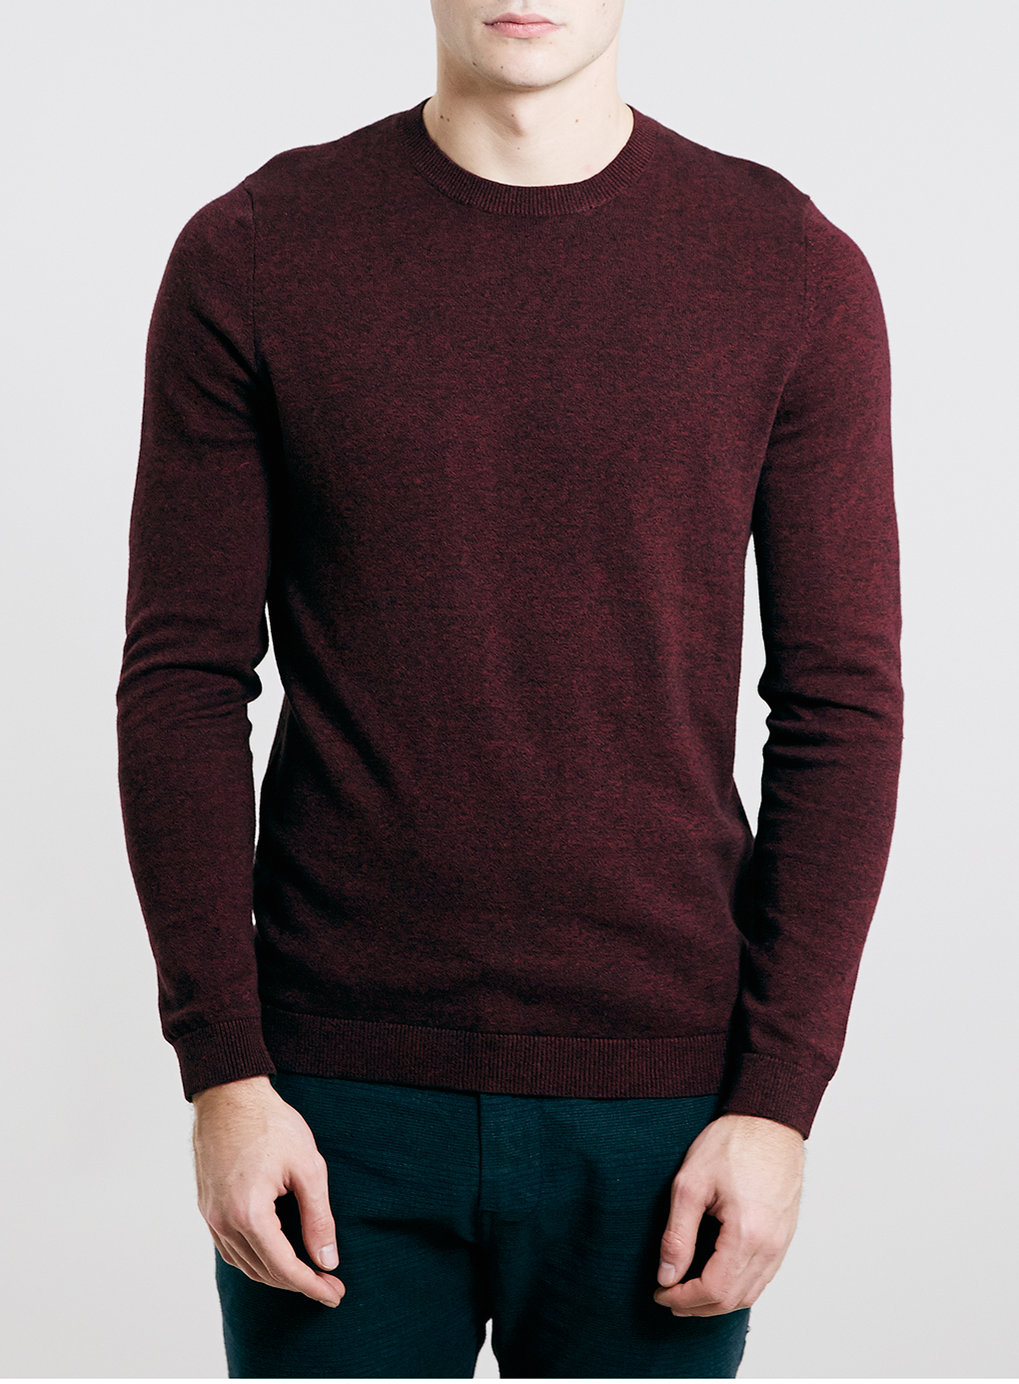 Volcom T Shirts Men